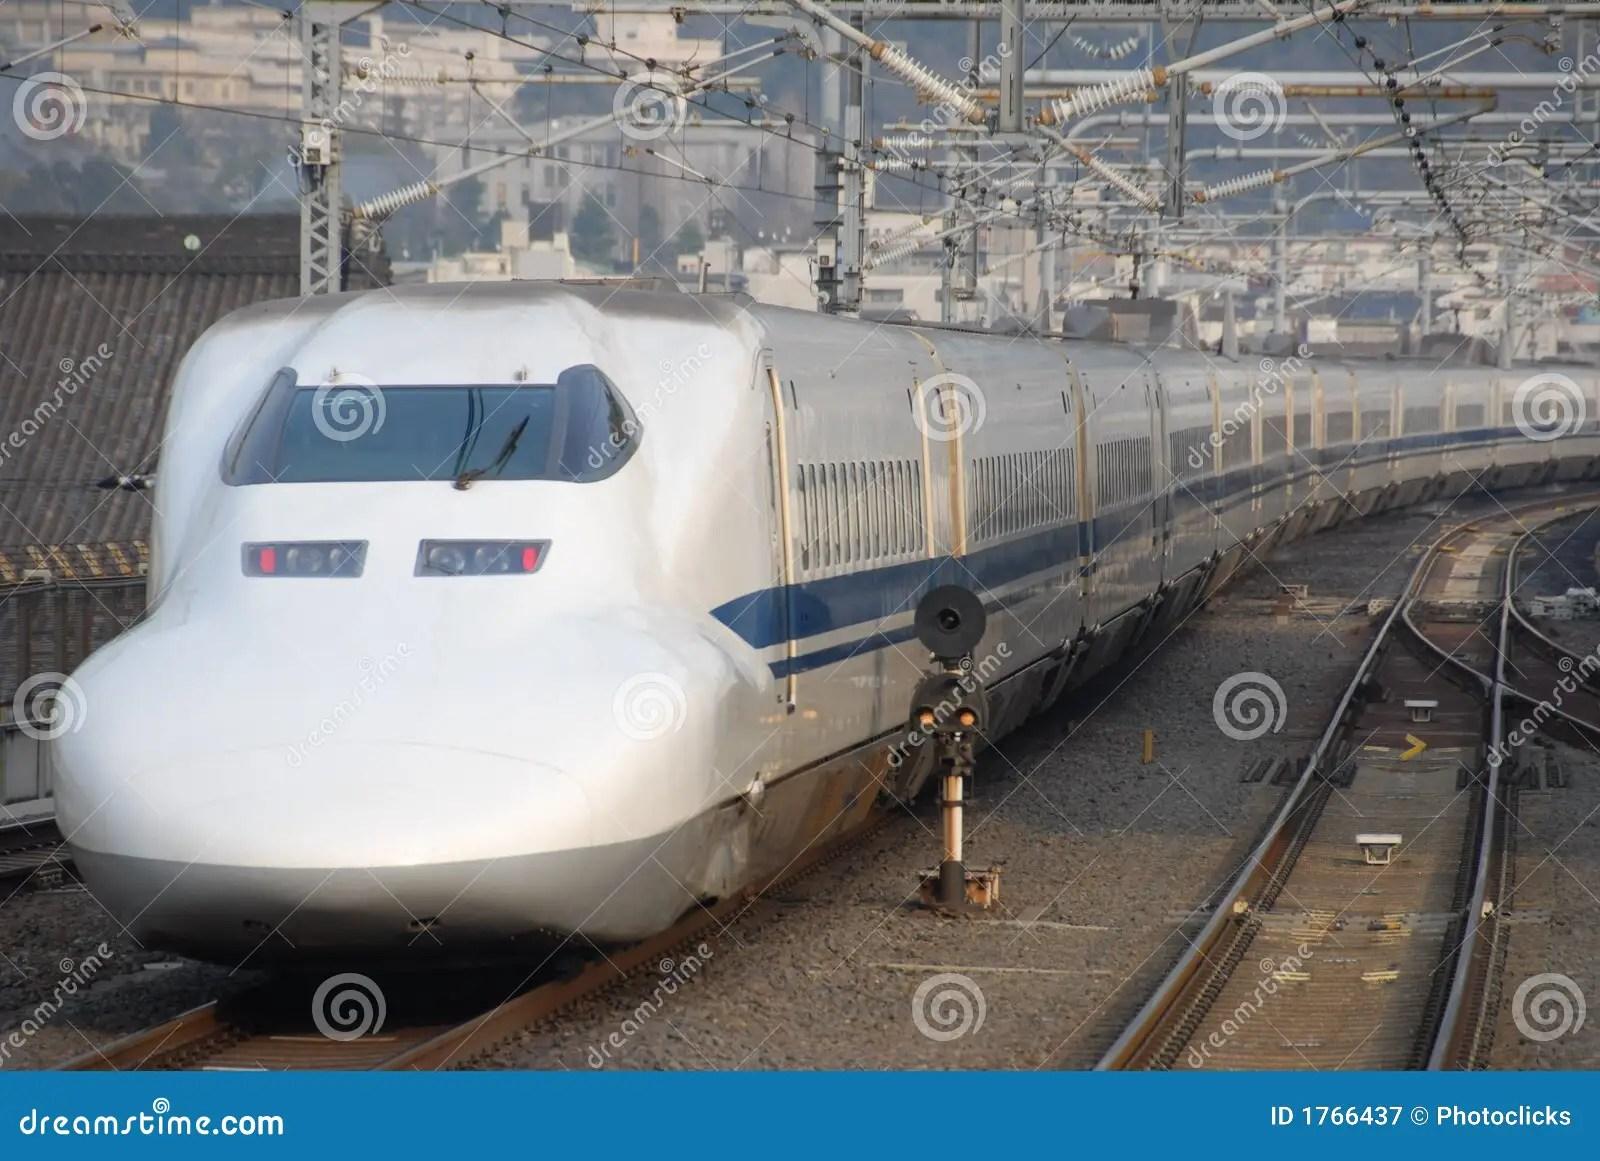 Shinkansen Bullet Train In Japan Stock Image